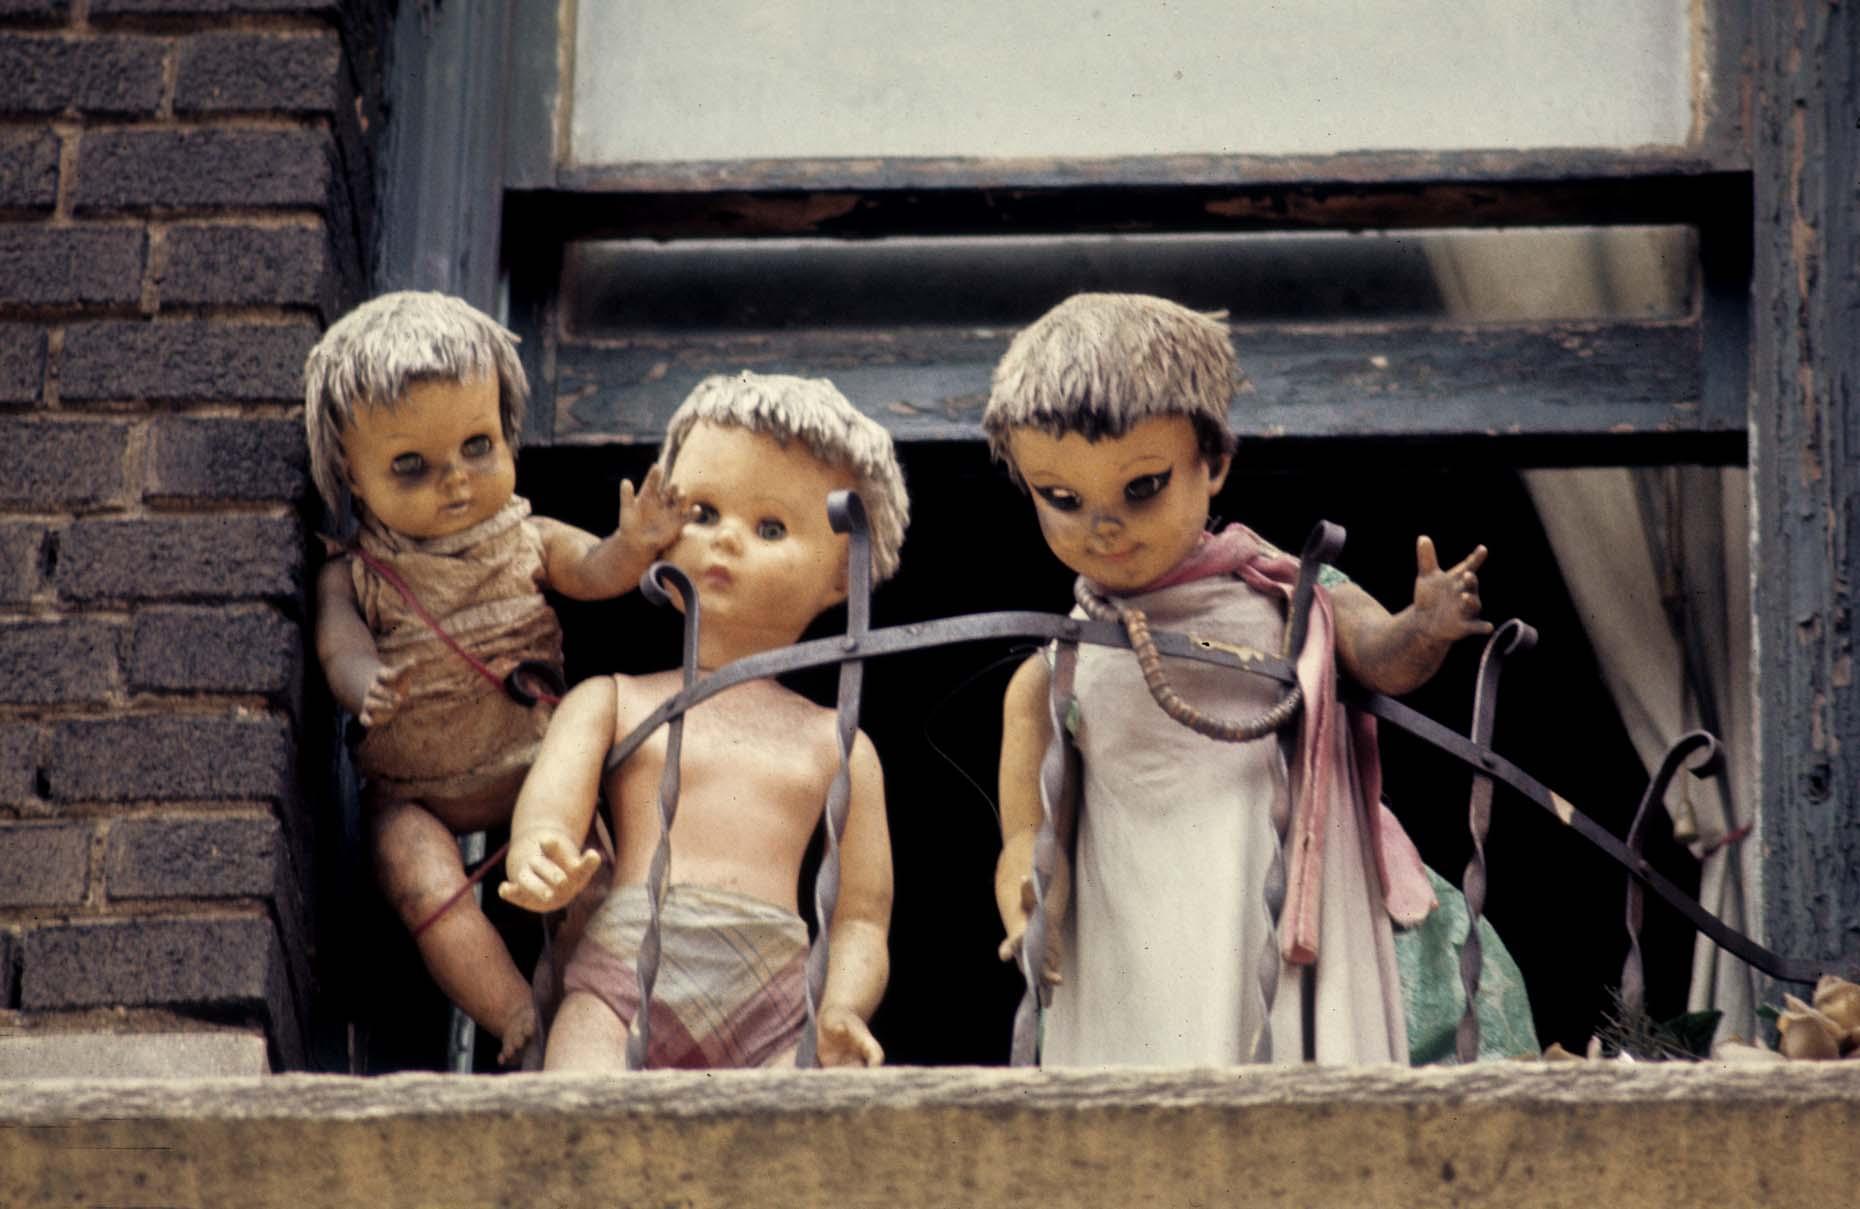 17_Dolls, South Bronx, 1970_